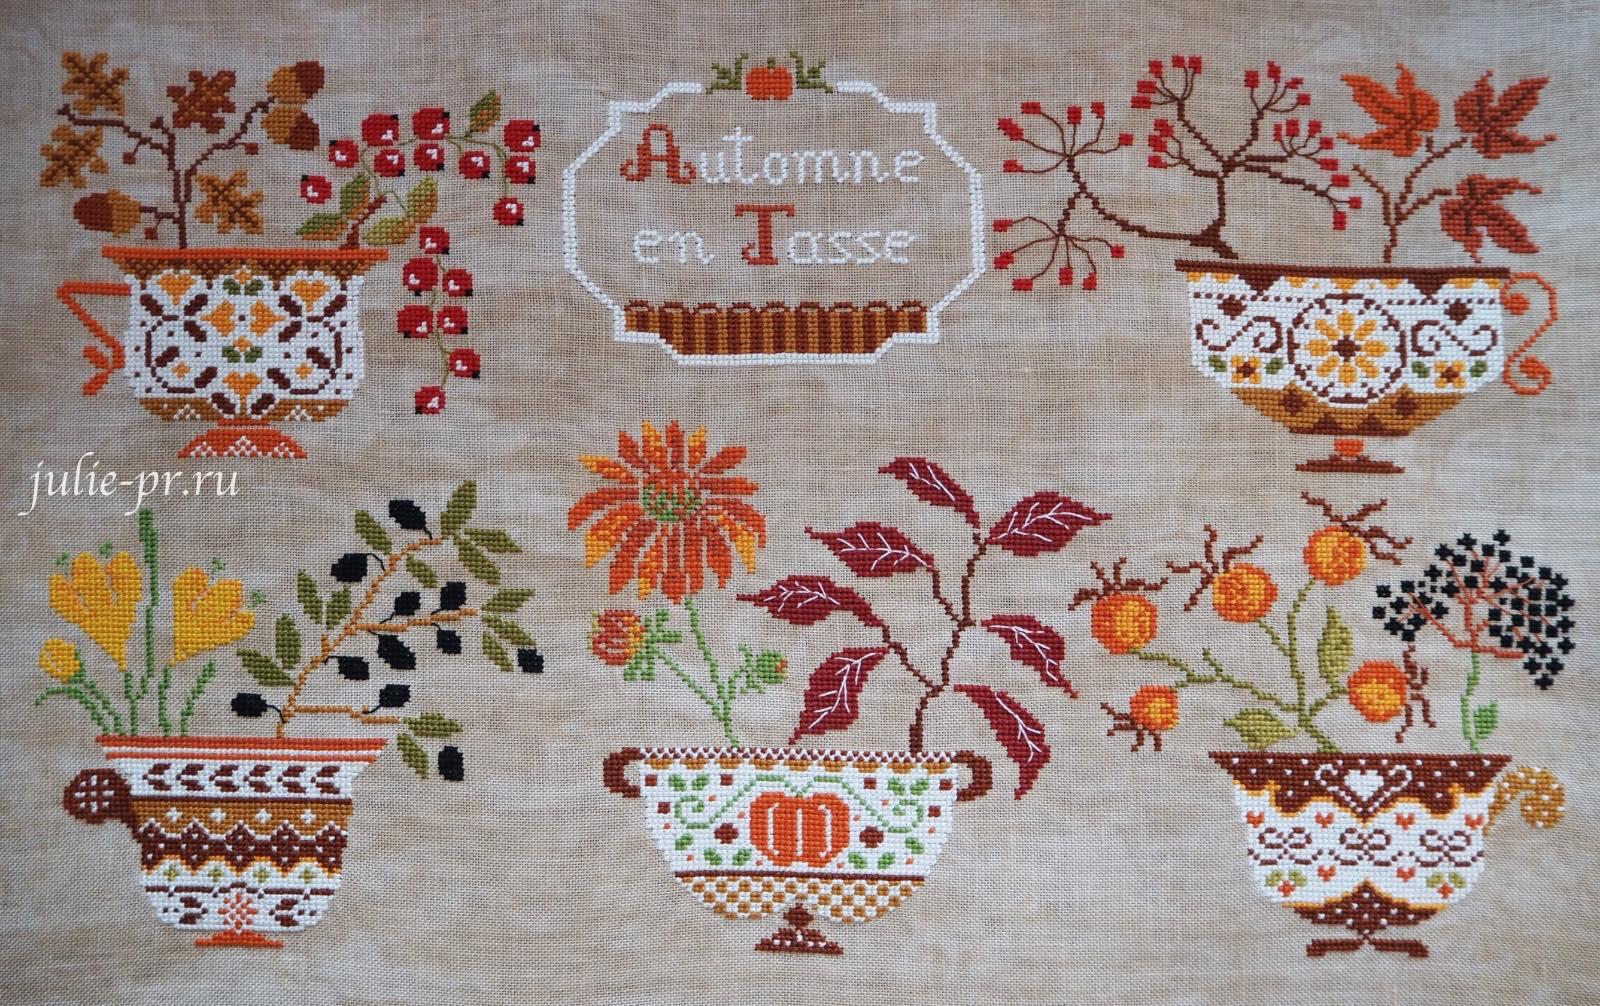 Cuore e Batticuore, Autunno in Tazza, осень в чашках, вышивка крестом, вышивка и кофе, мулине dmc